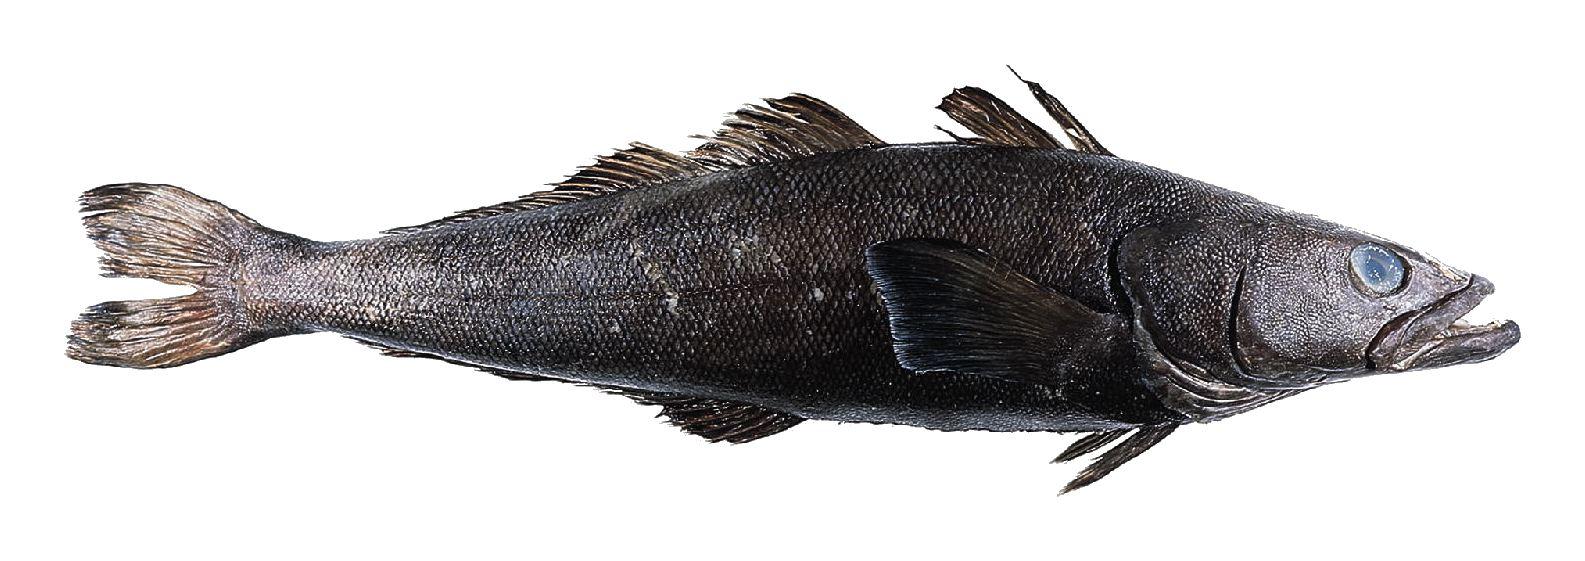 Patagonian Toothfish (Chilean Sea Bass)